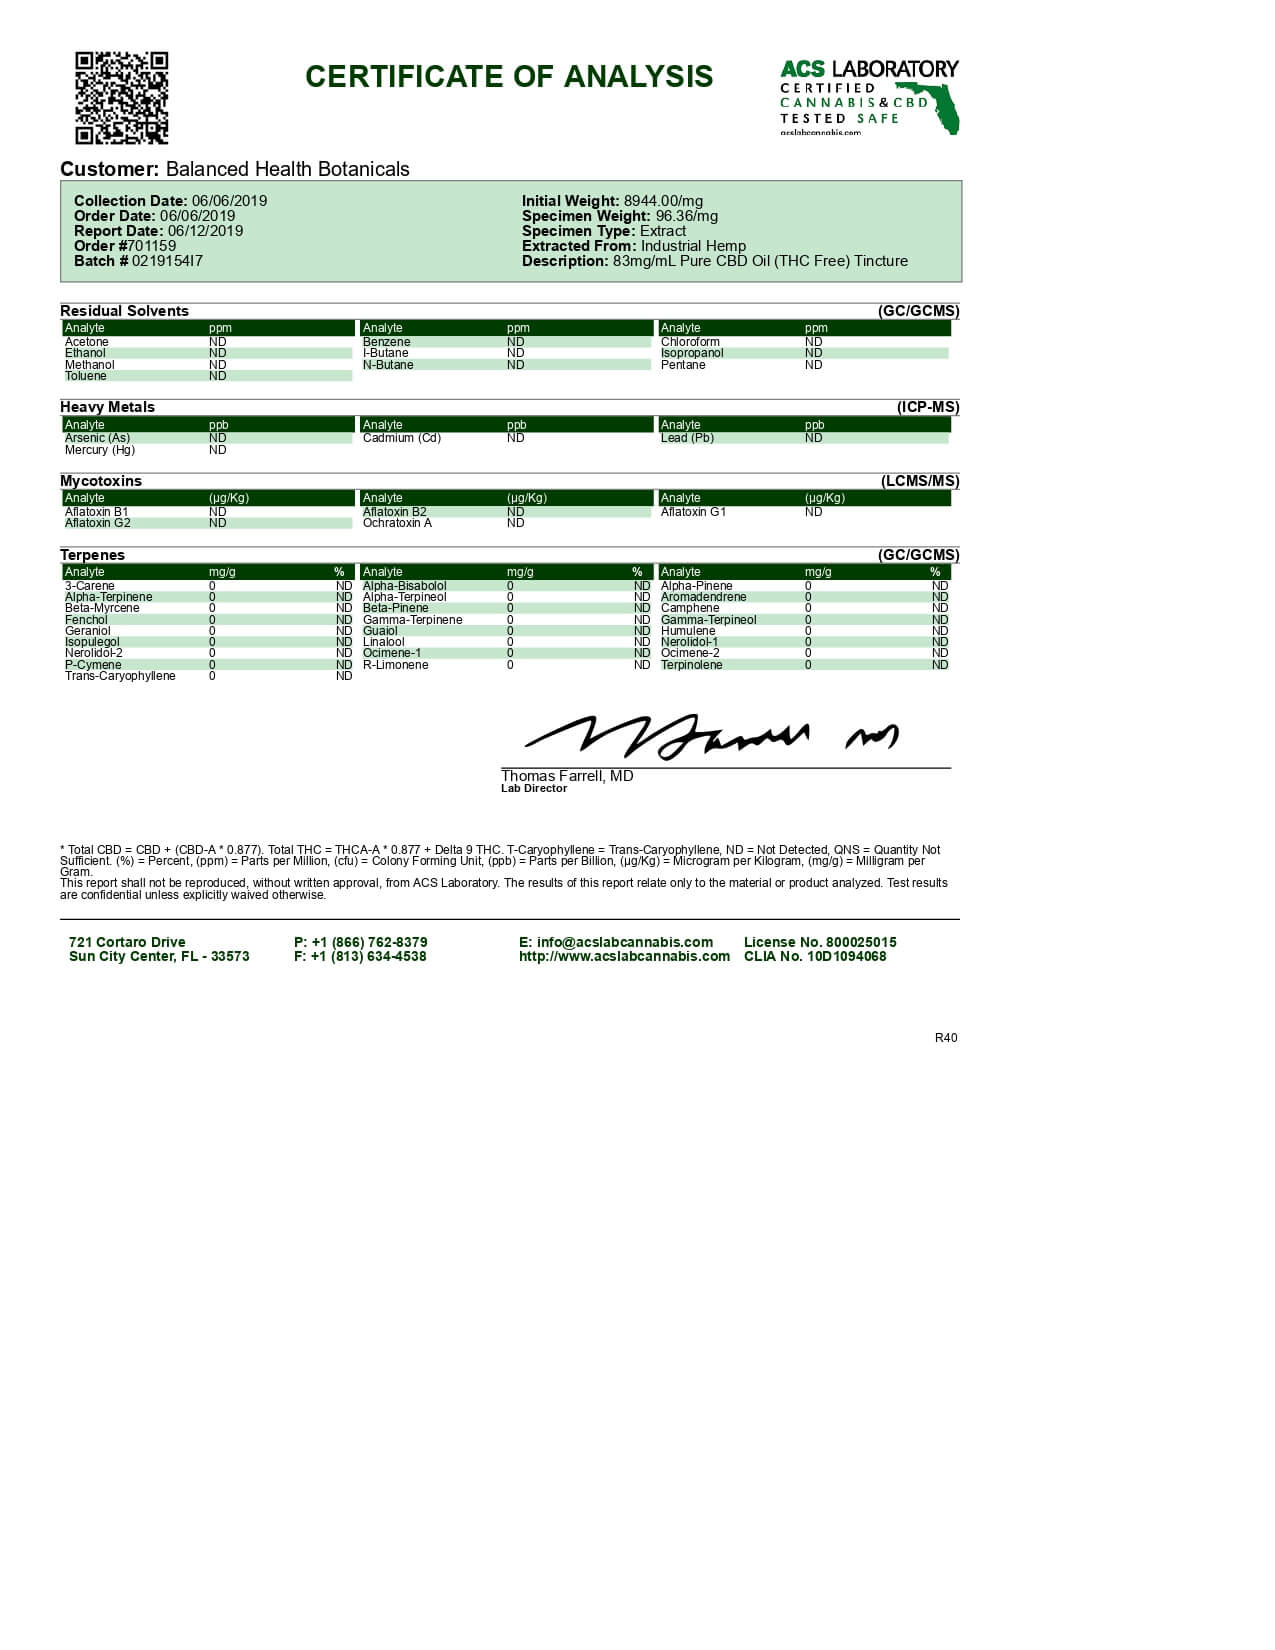 CBDistillery CBD Tincture Isolate Oil 2500mg Lab Report